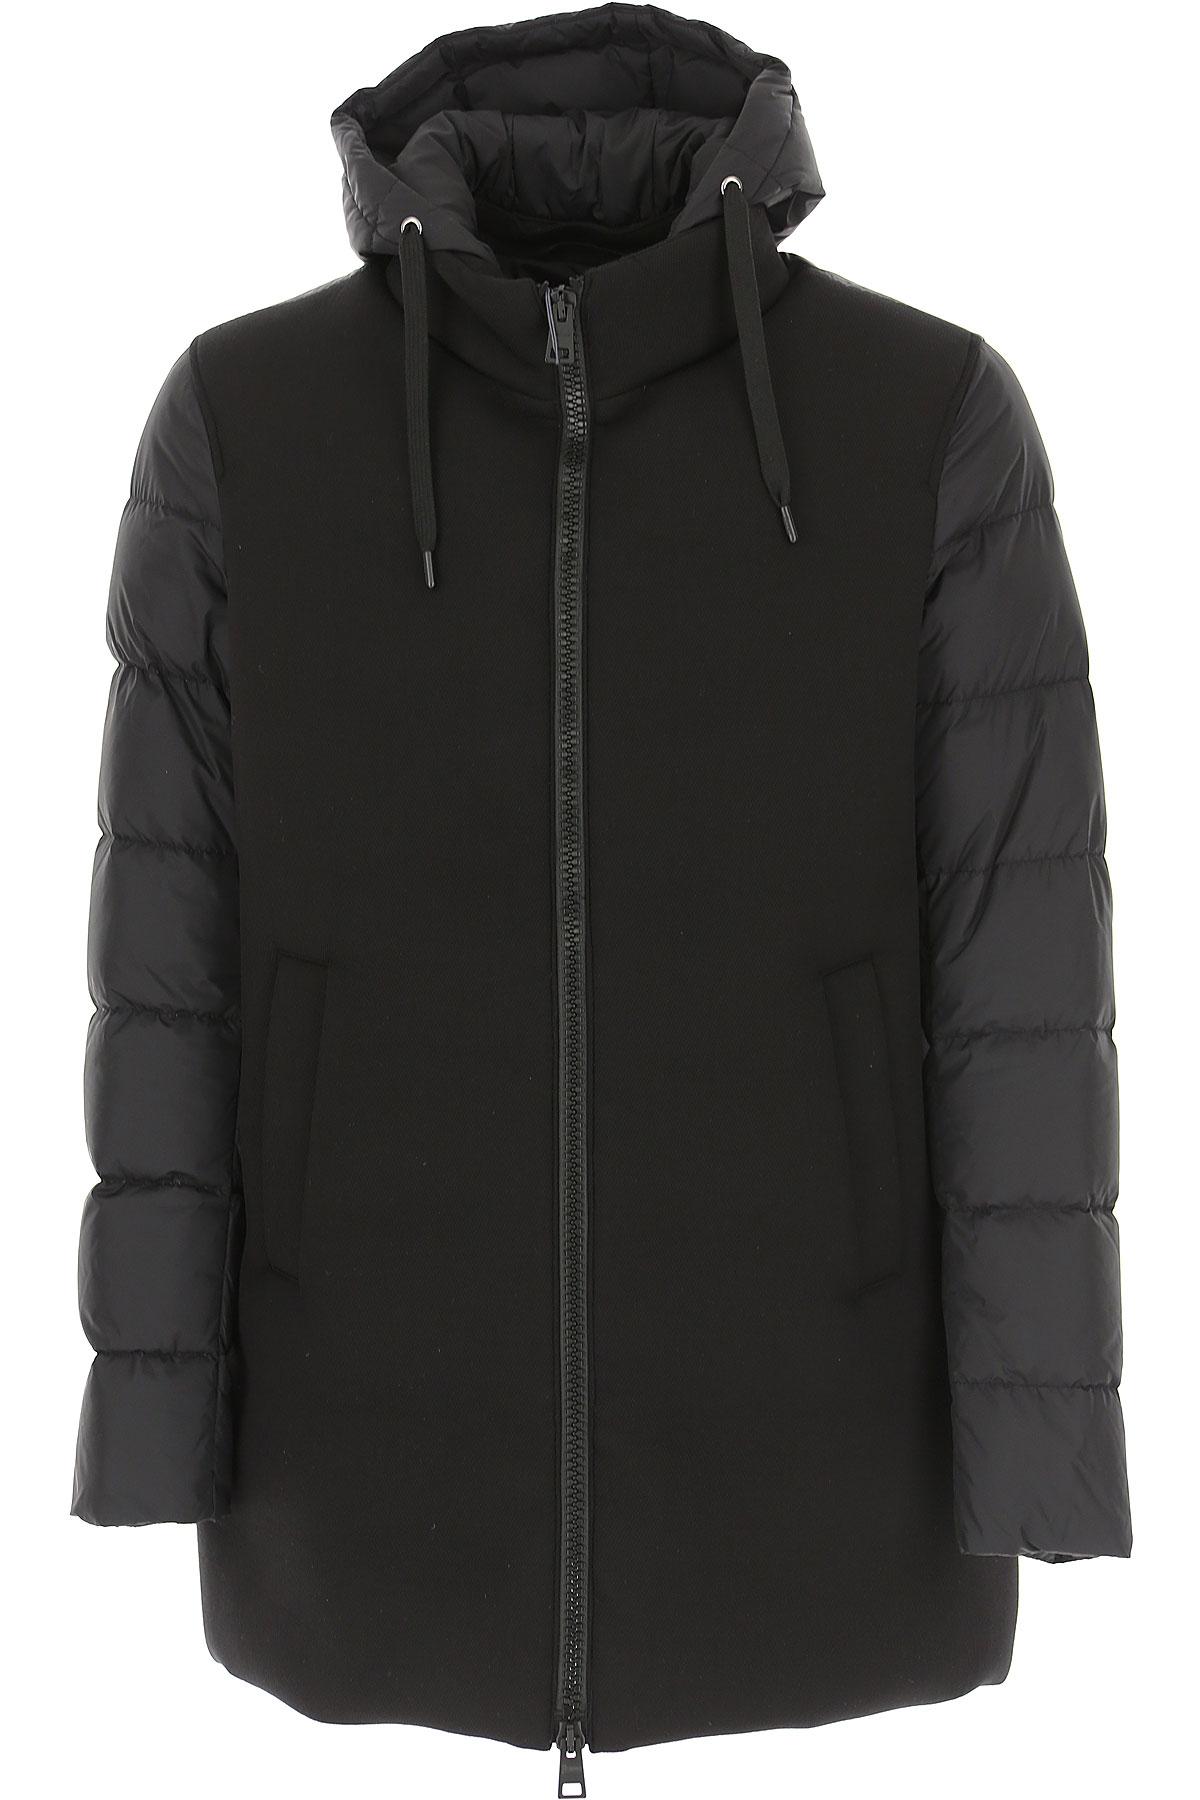 Herno Down Jacket for Men, Puffer Ski Jacket On Sale, Black, Down, 2019, L XL